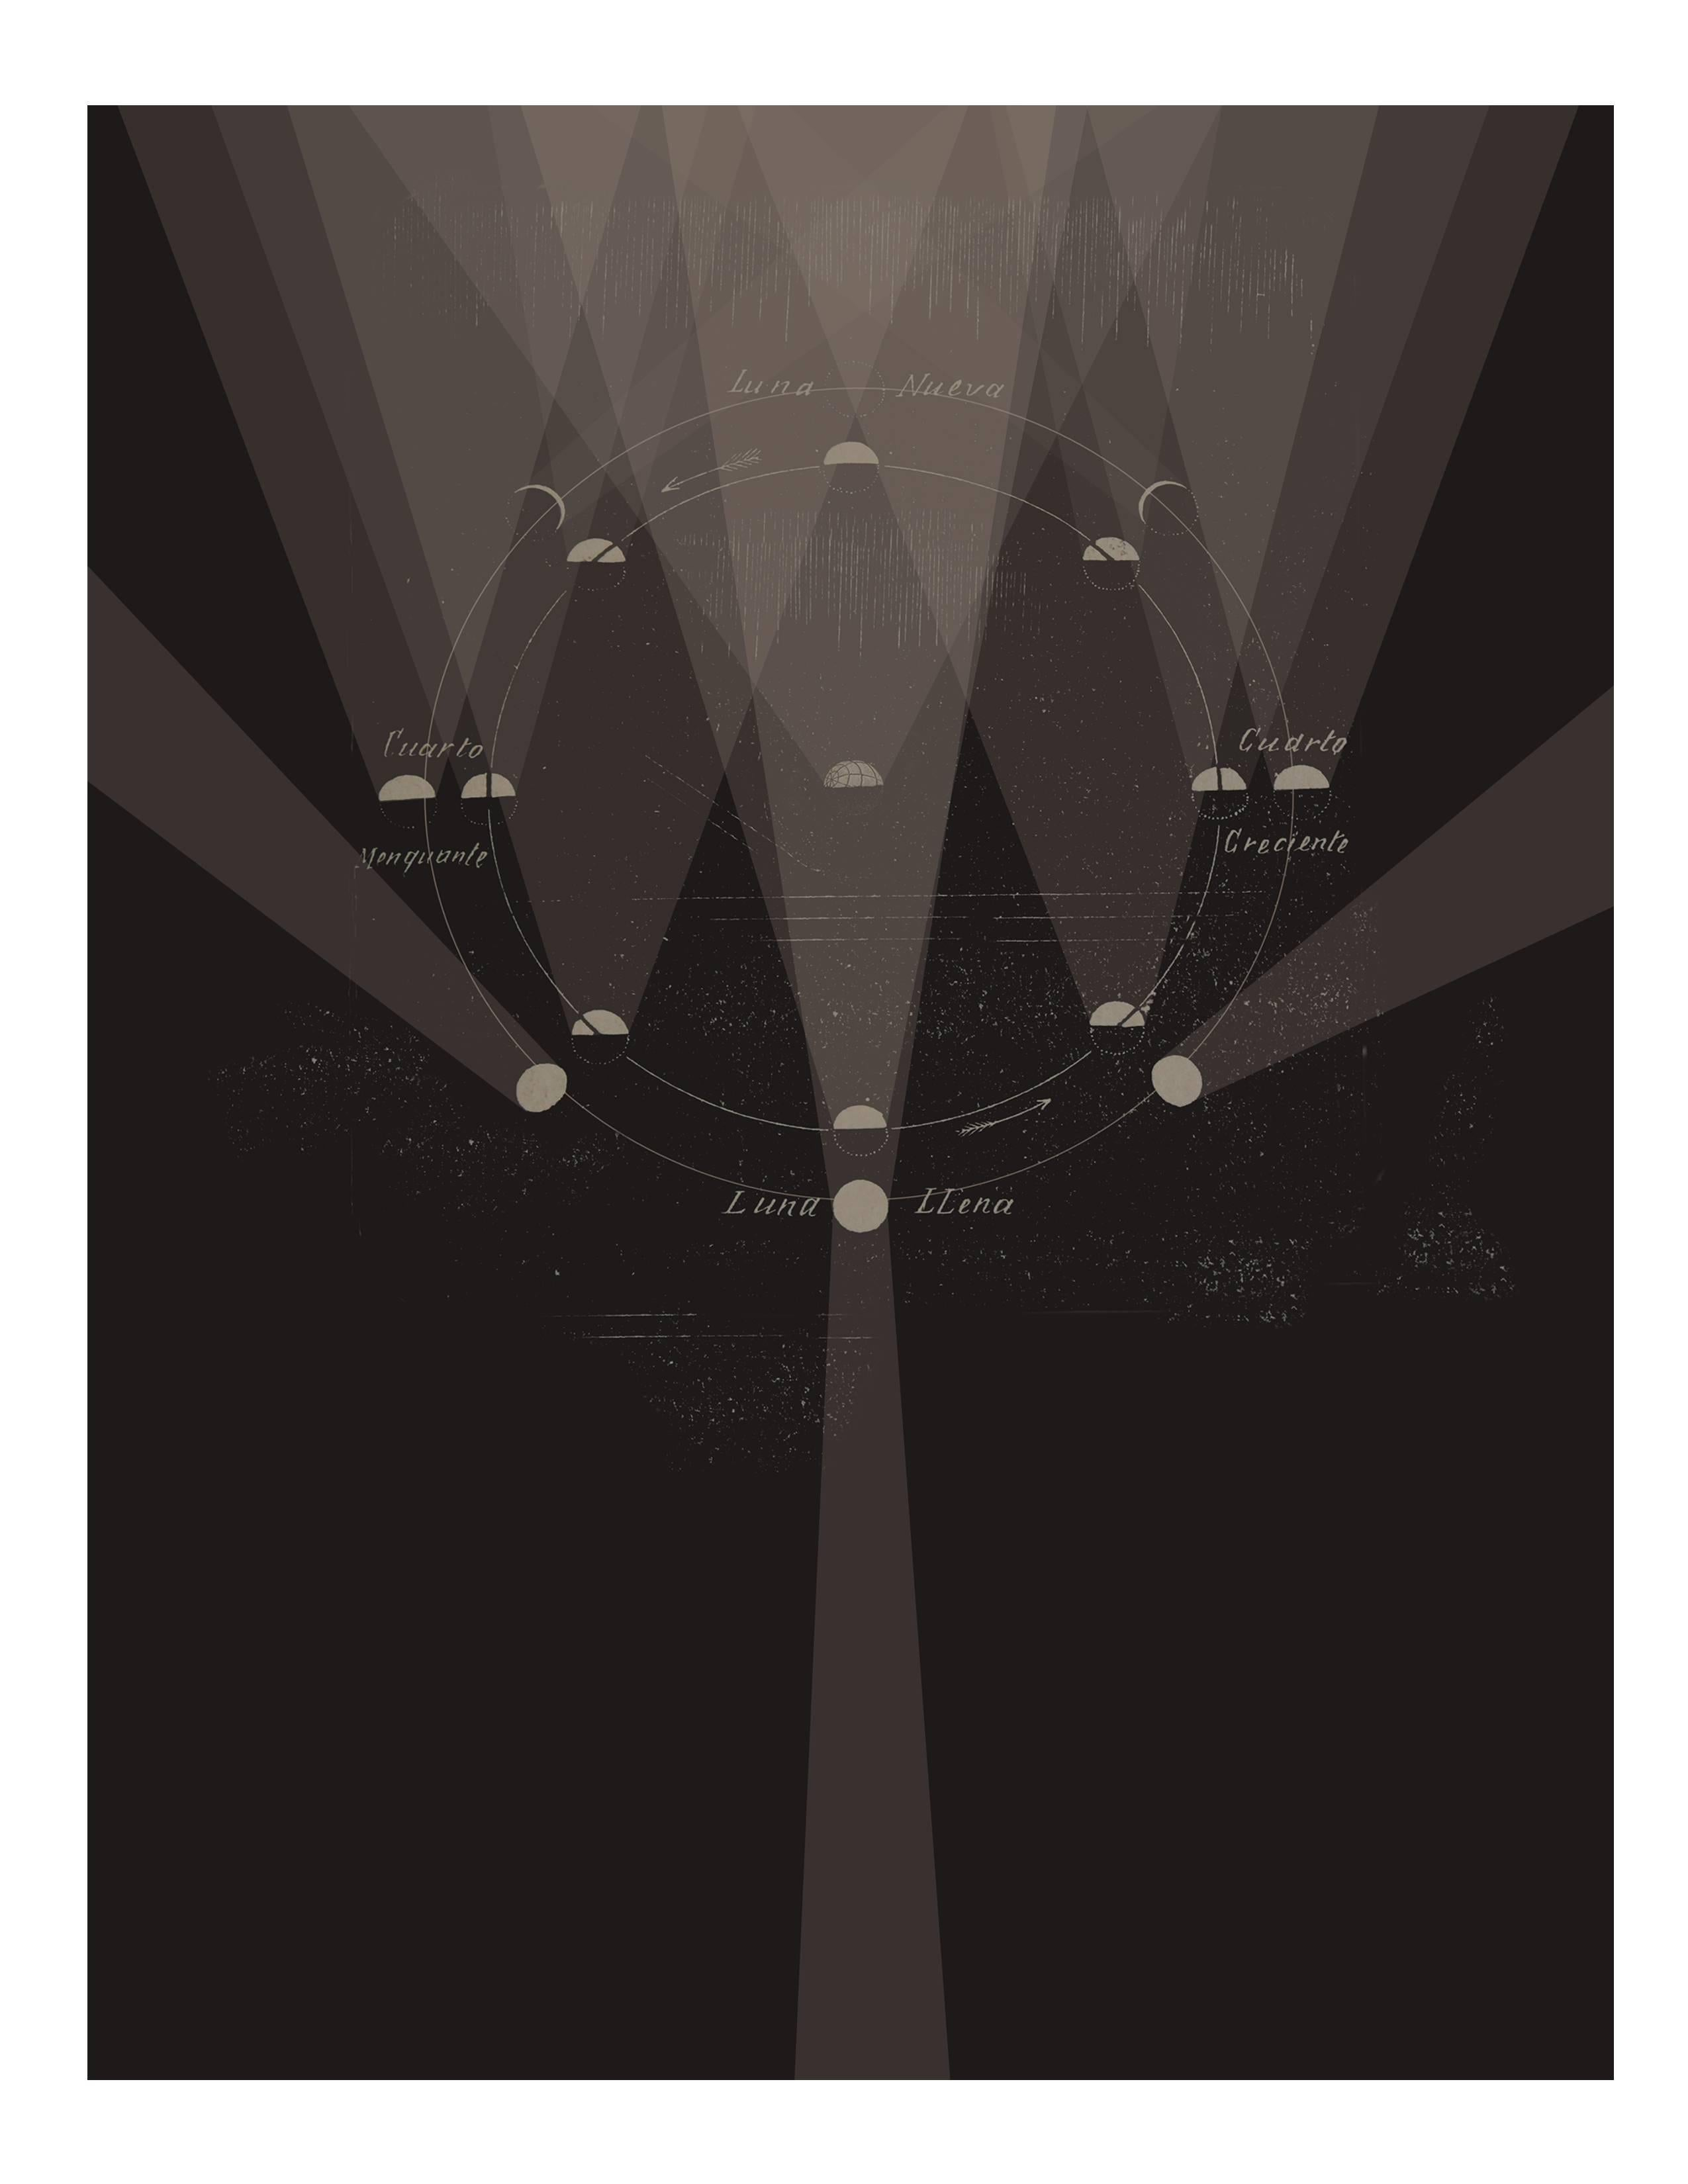 Ficción Astronómica 4